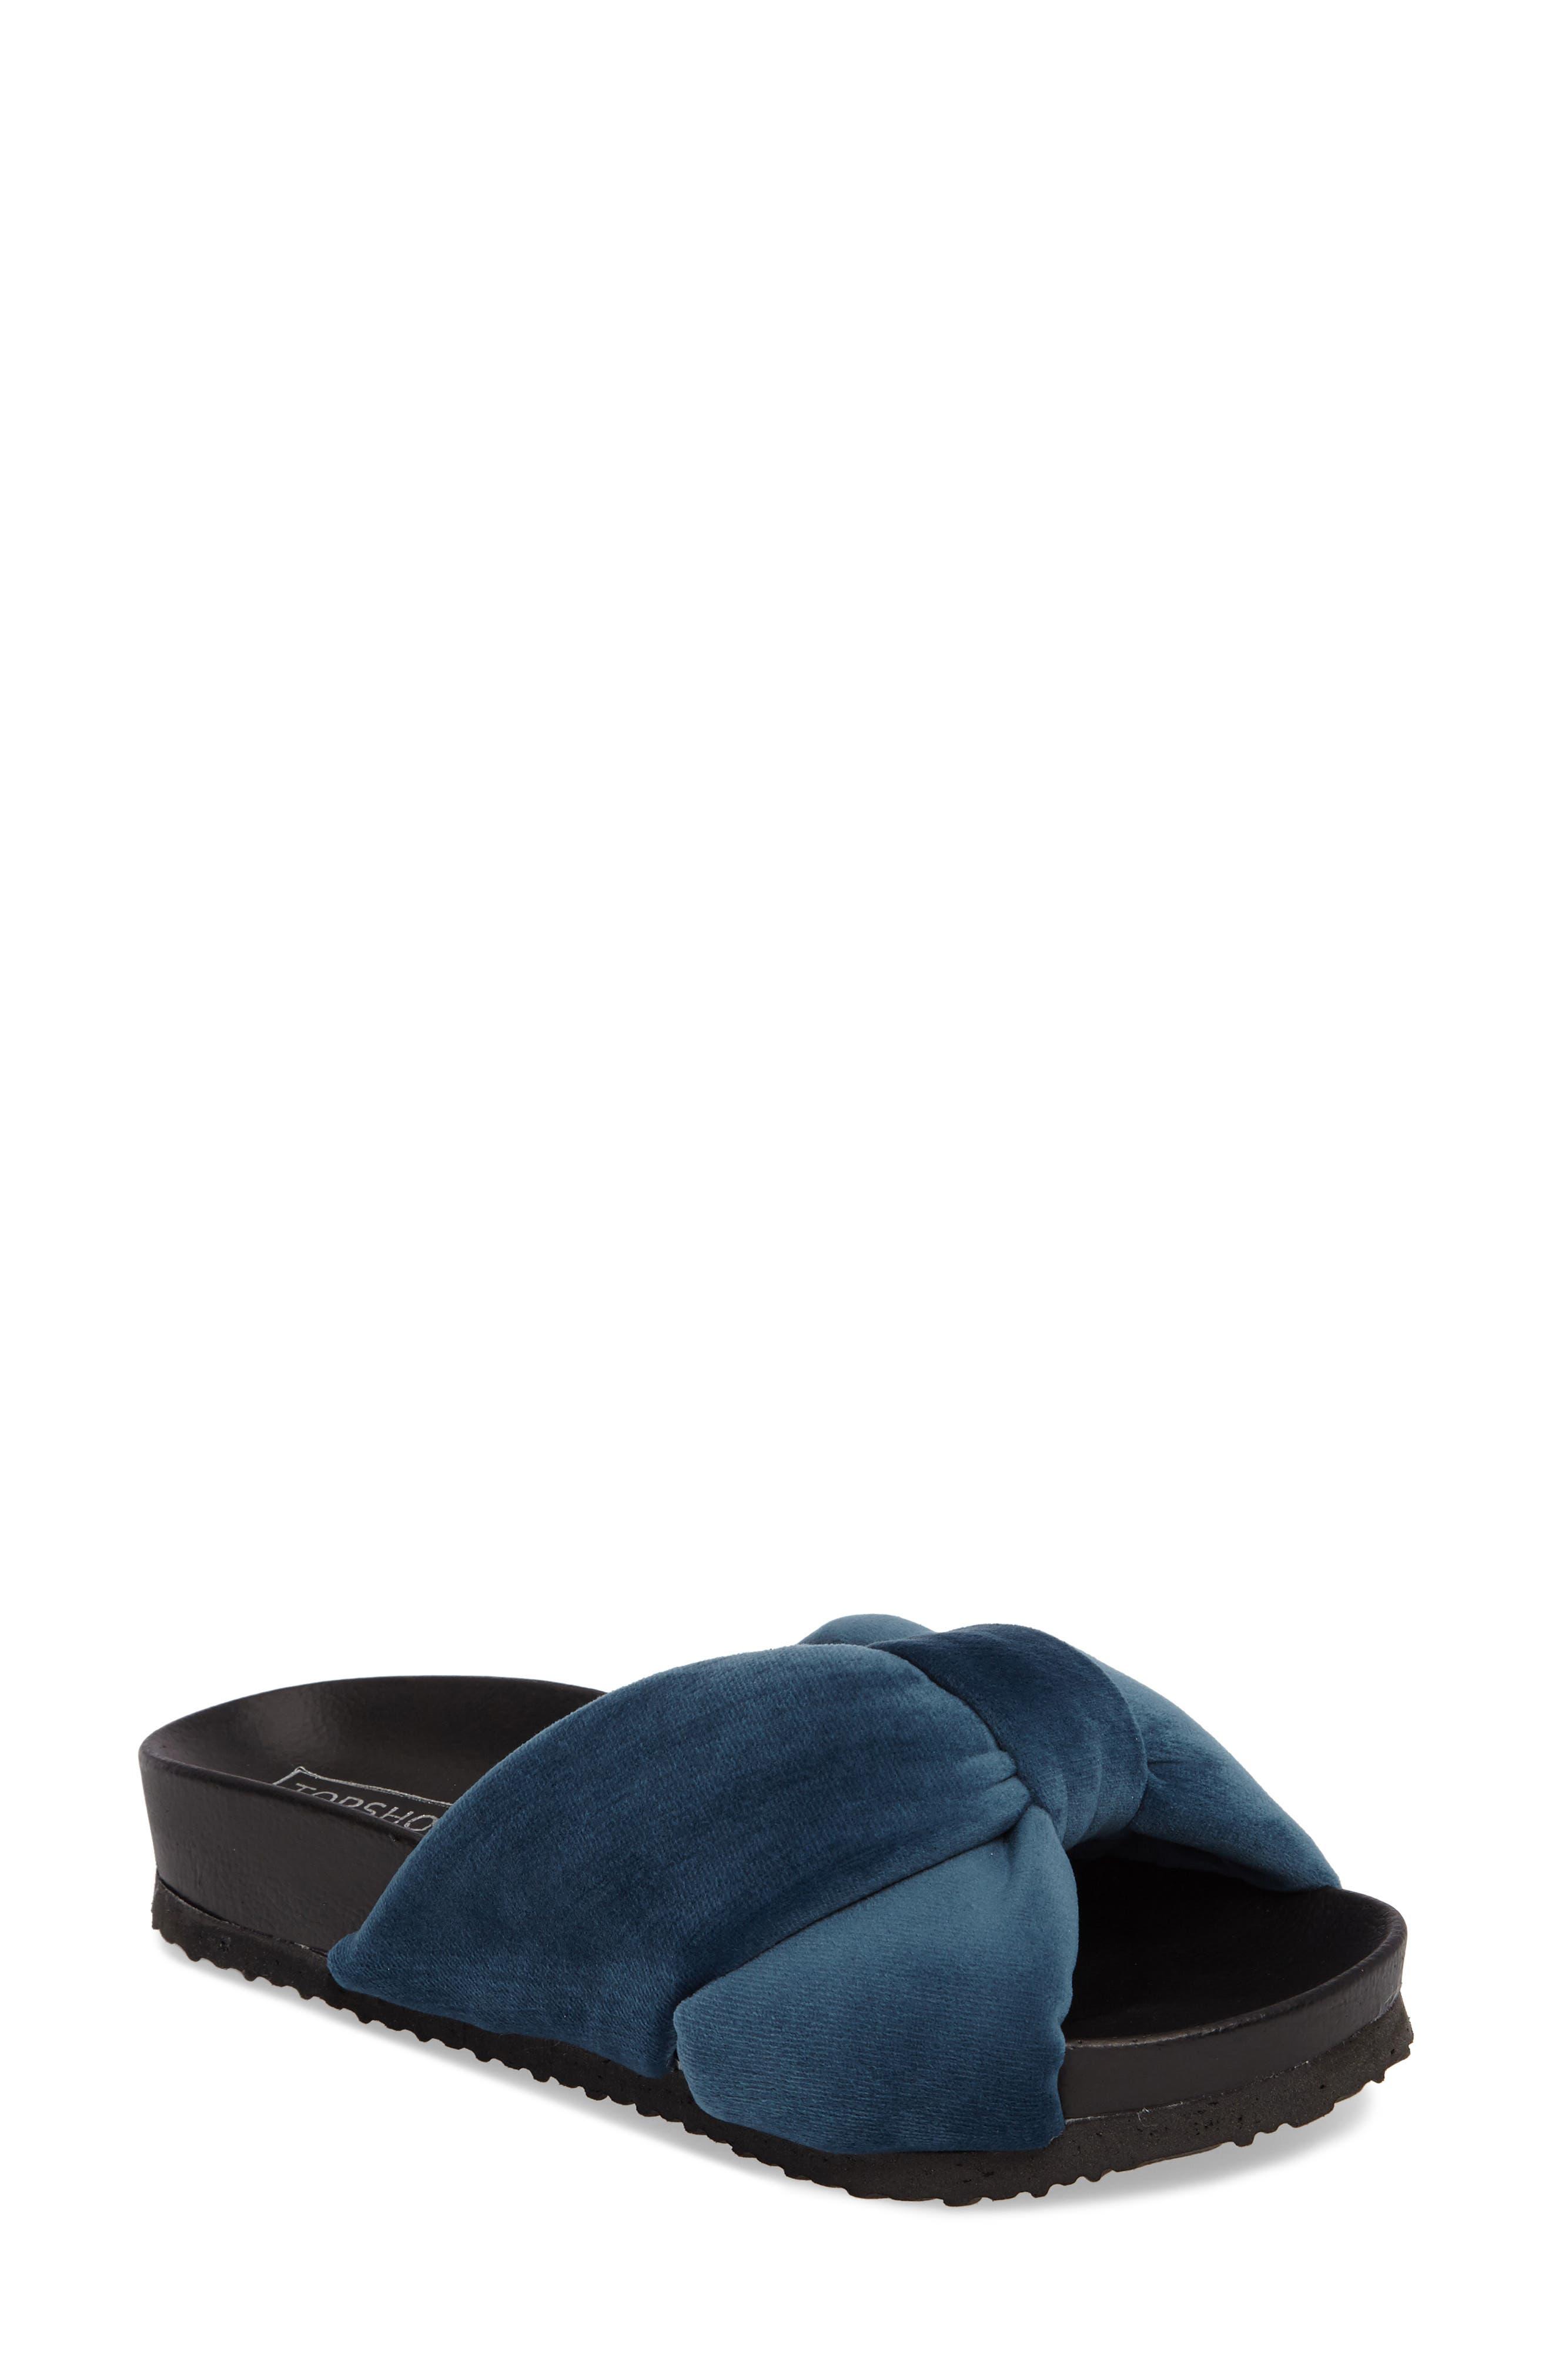 Main Image - Topshop Fly Knot Slide Sandal (Women)